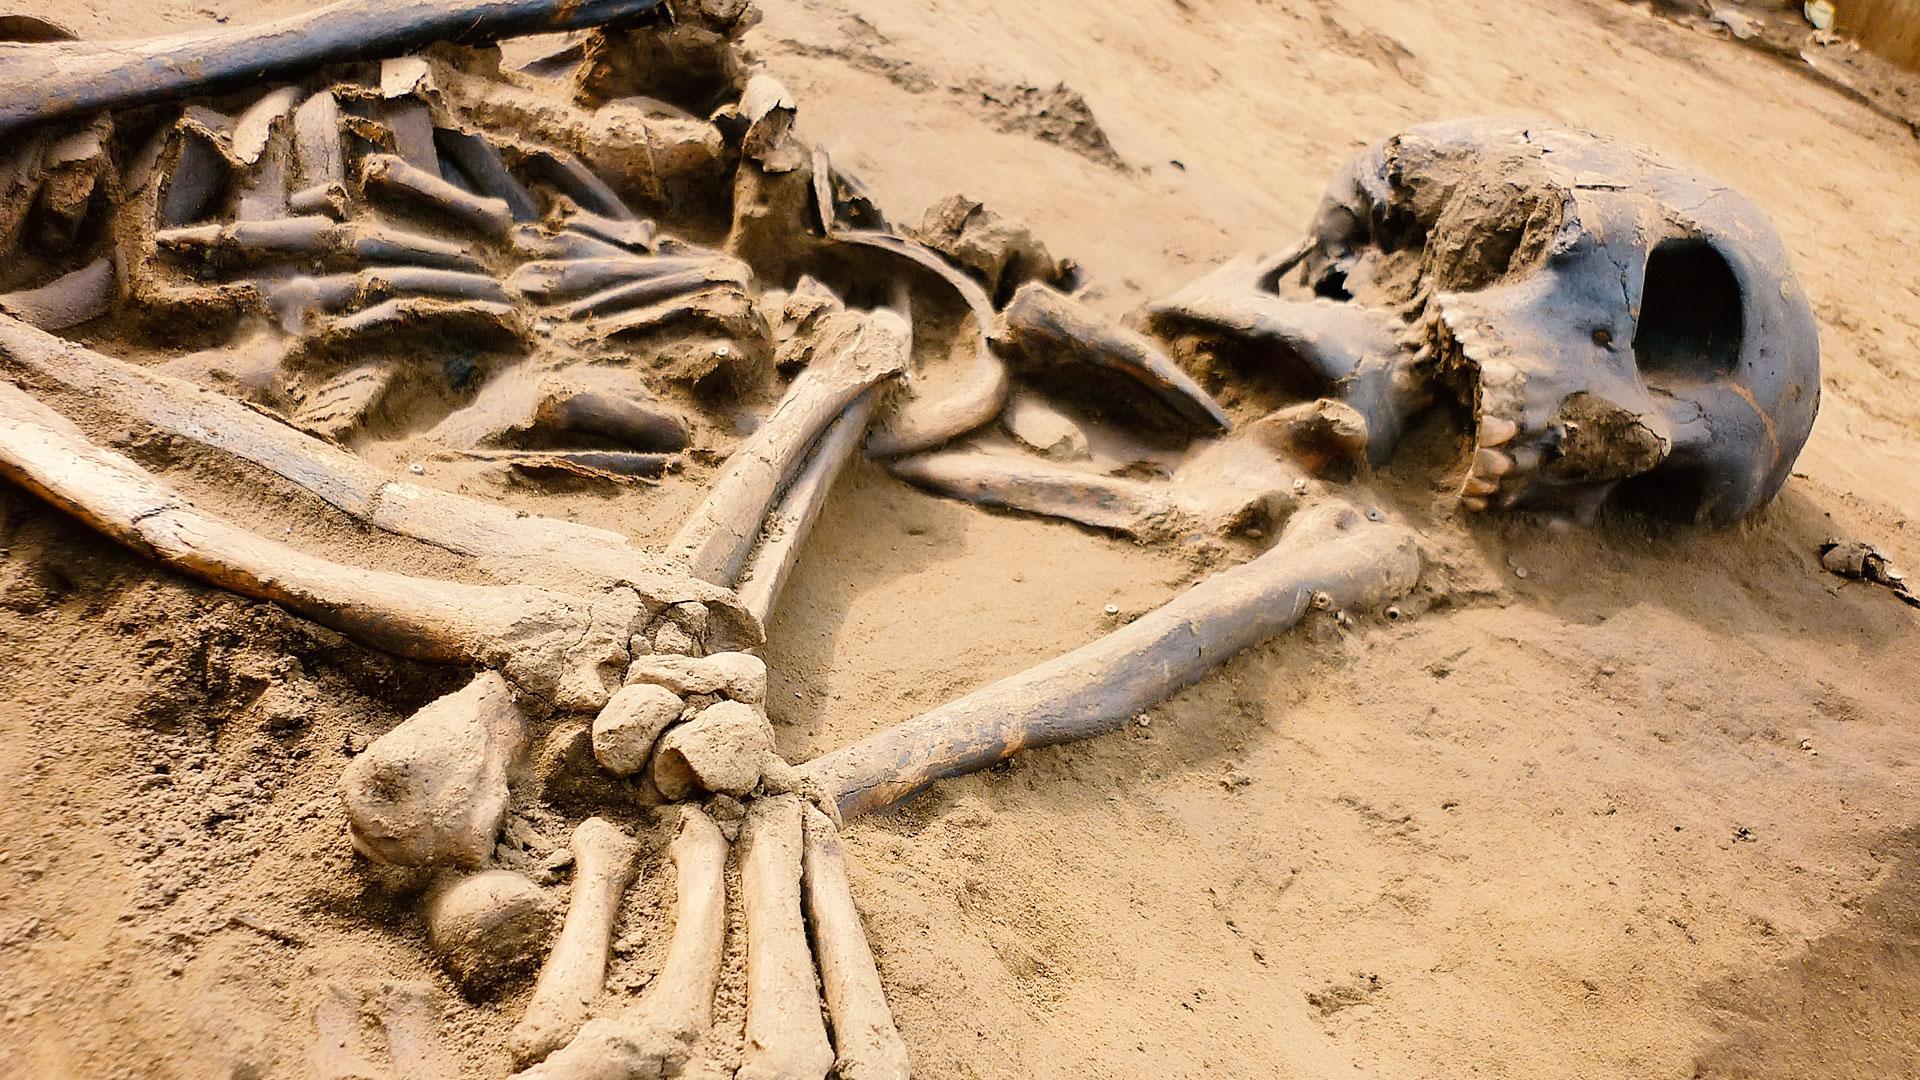 skeletonbonesas_hdv.jpg?itok=2wo135T4